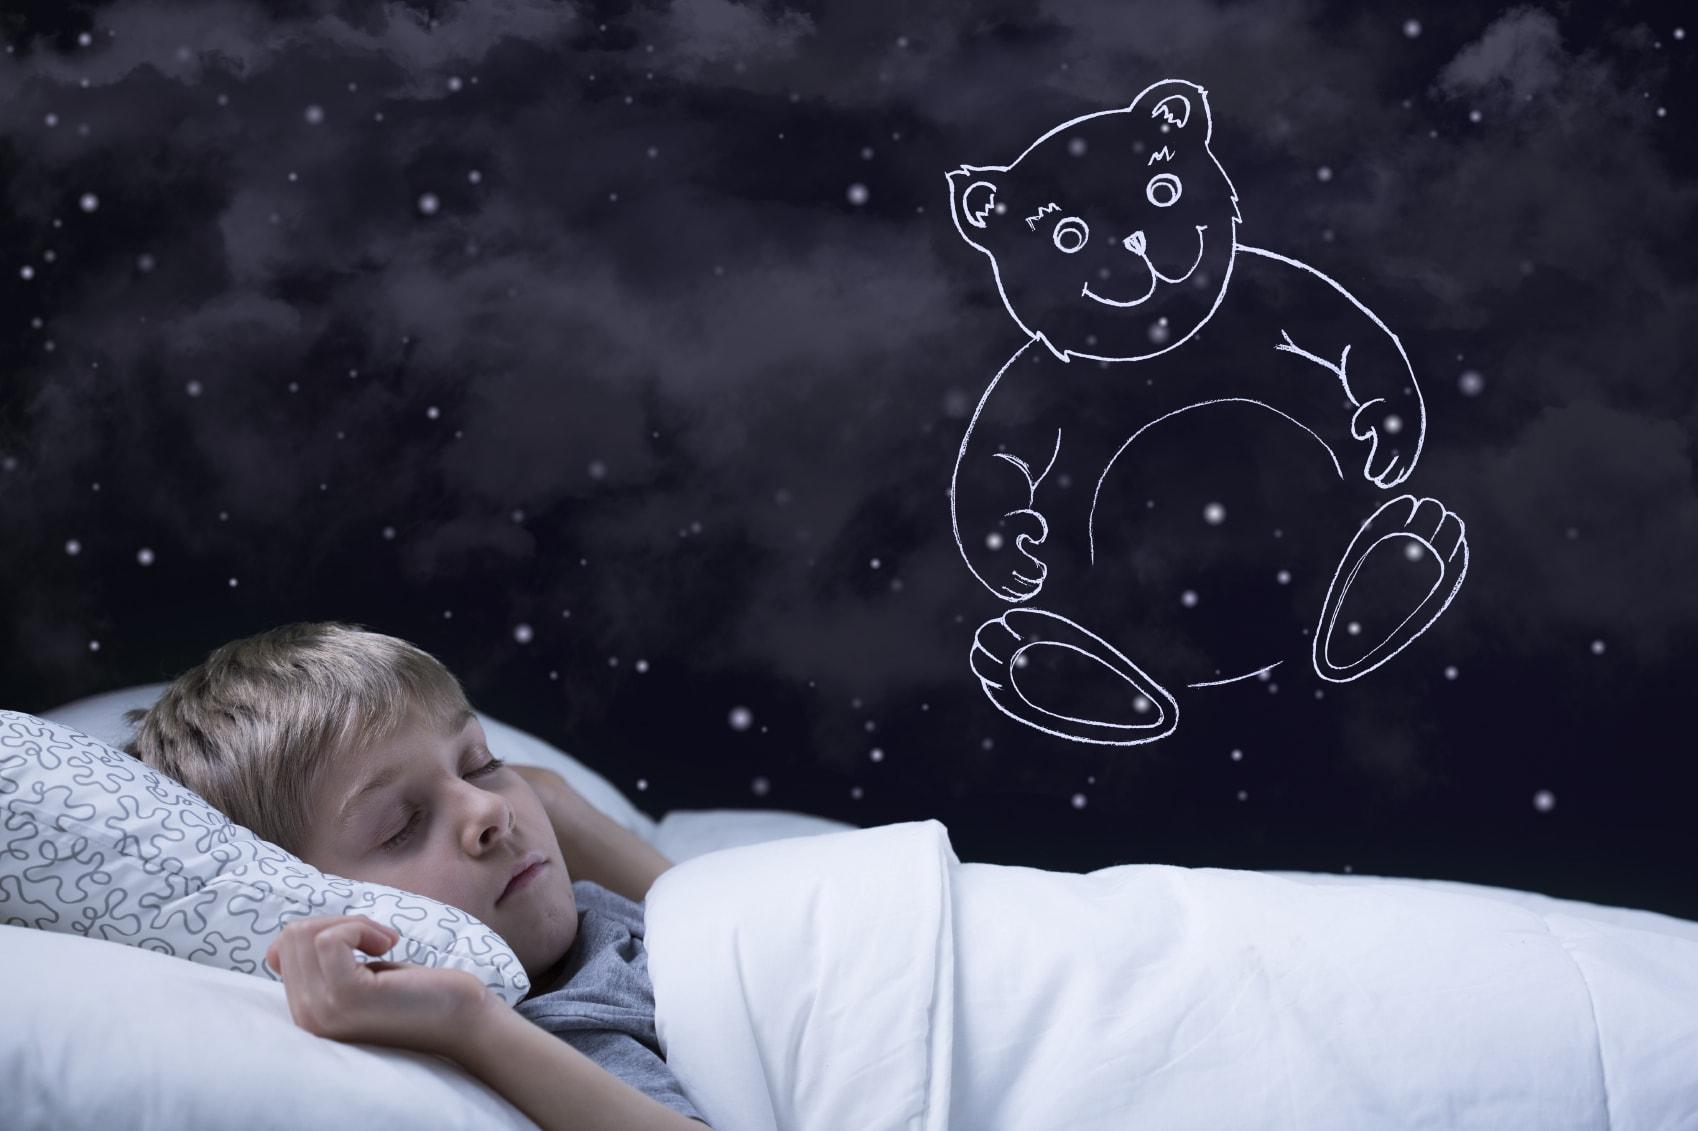 10 tips to help your child sleep